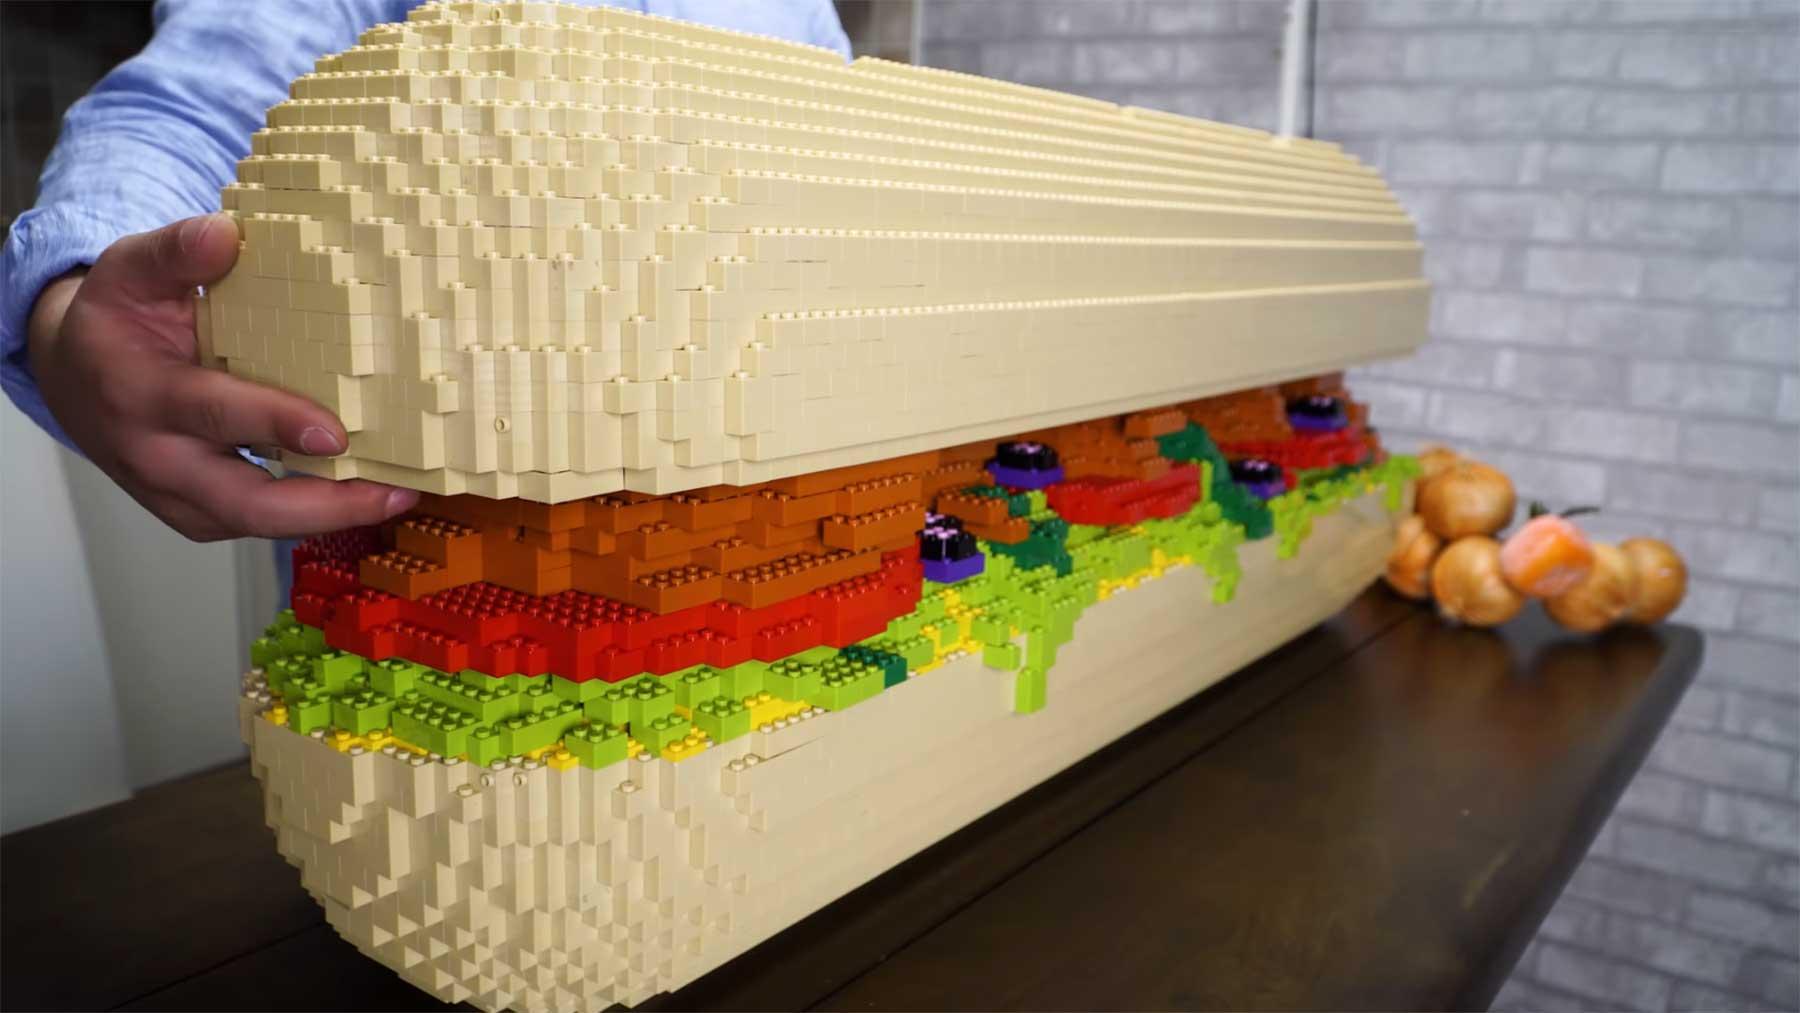 Bebop belegt ein gigantisches LEGO-Sandwich Lego-Very-Large-Sandwich-Lego-In-Real-Life-9